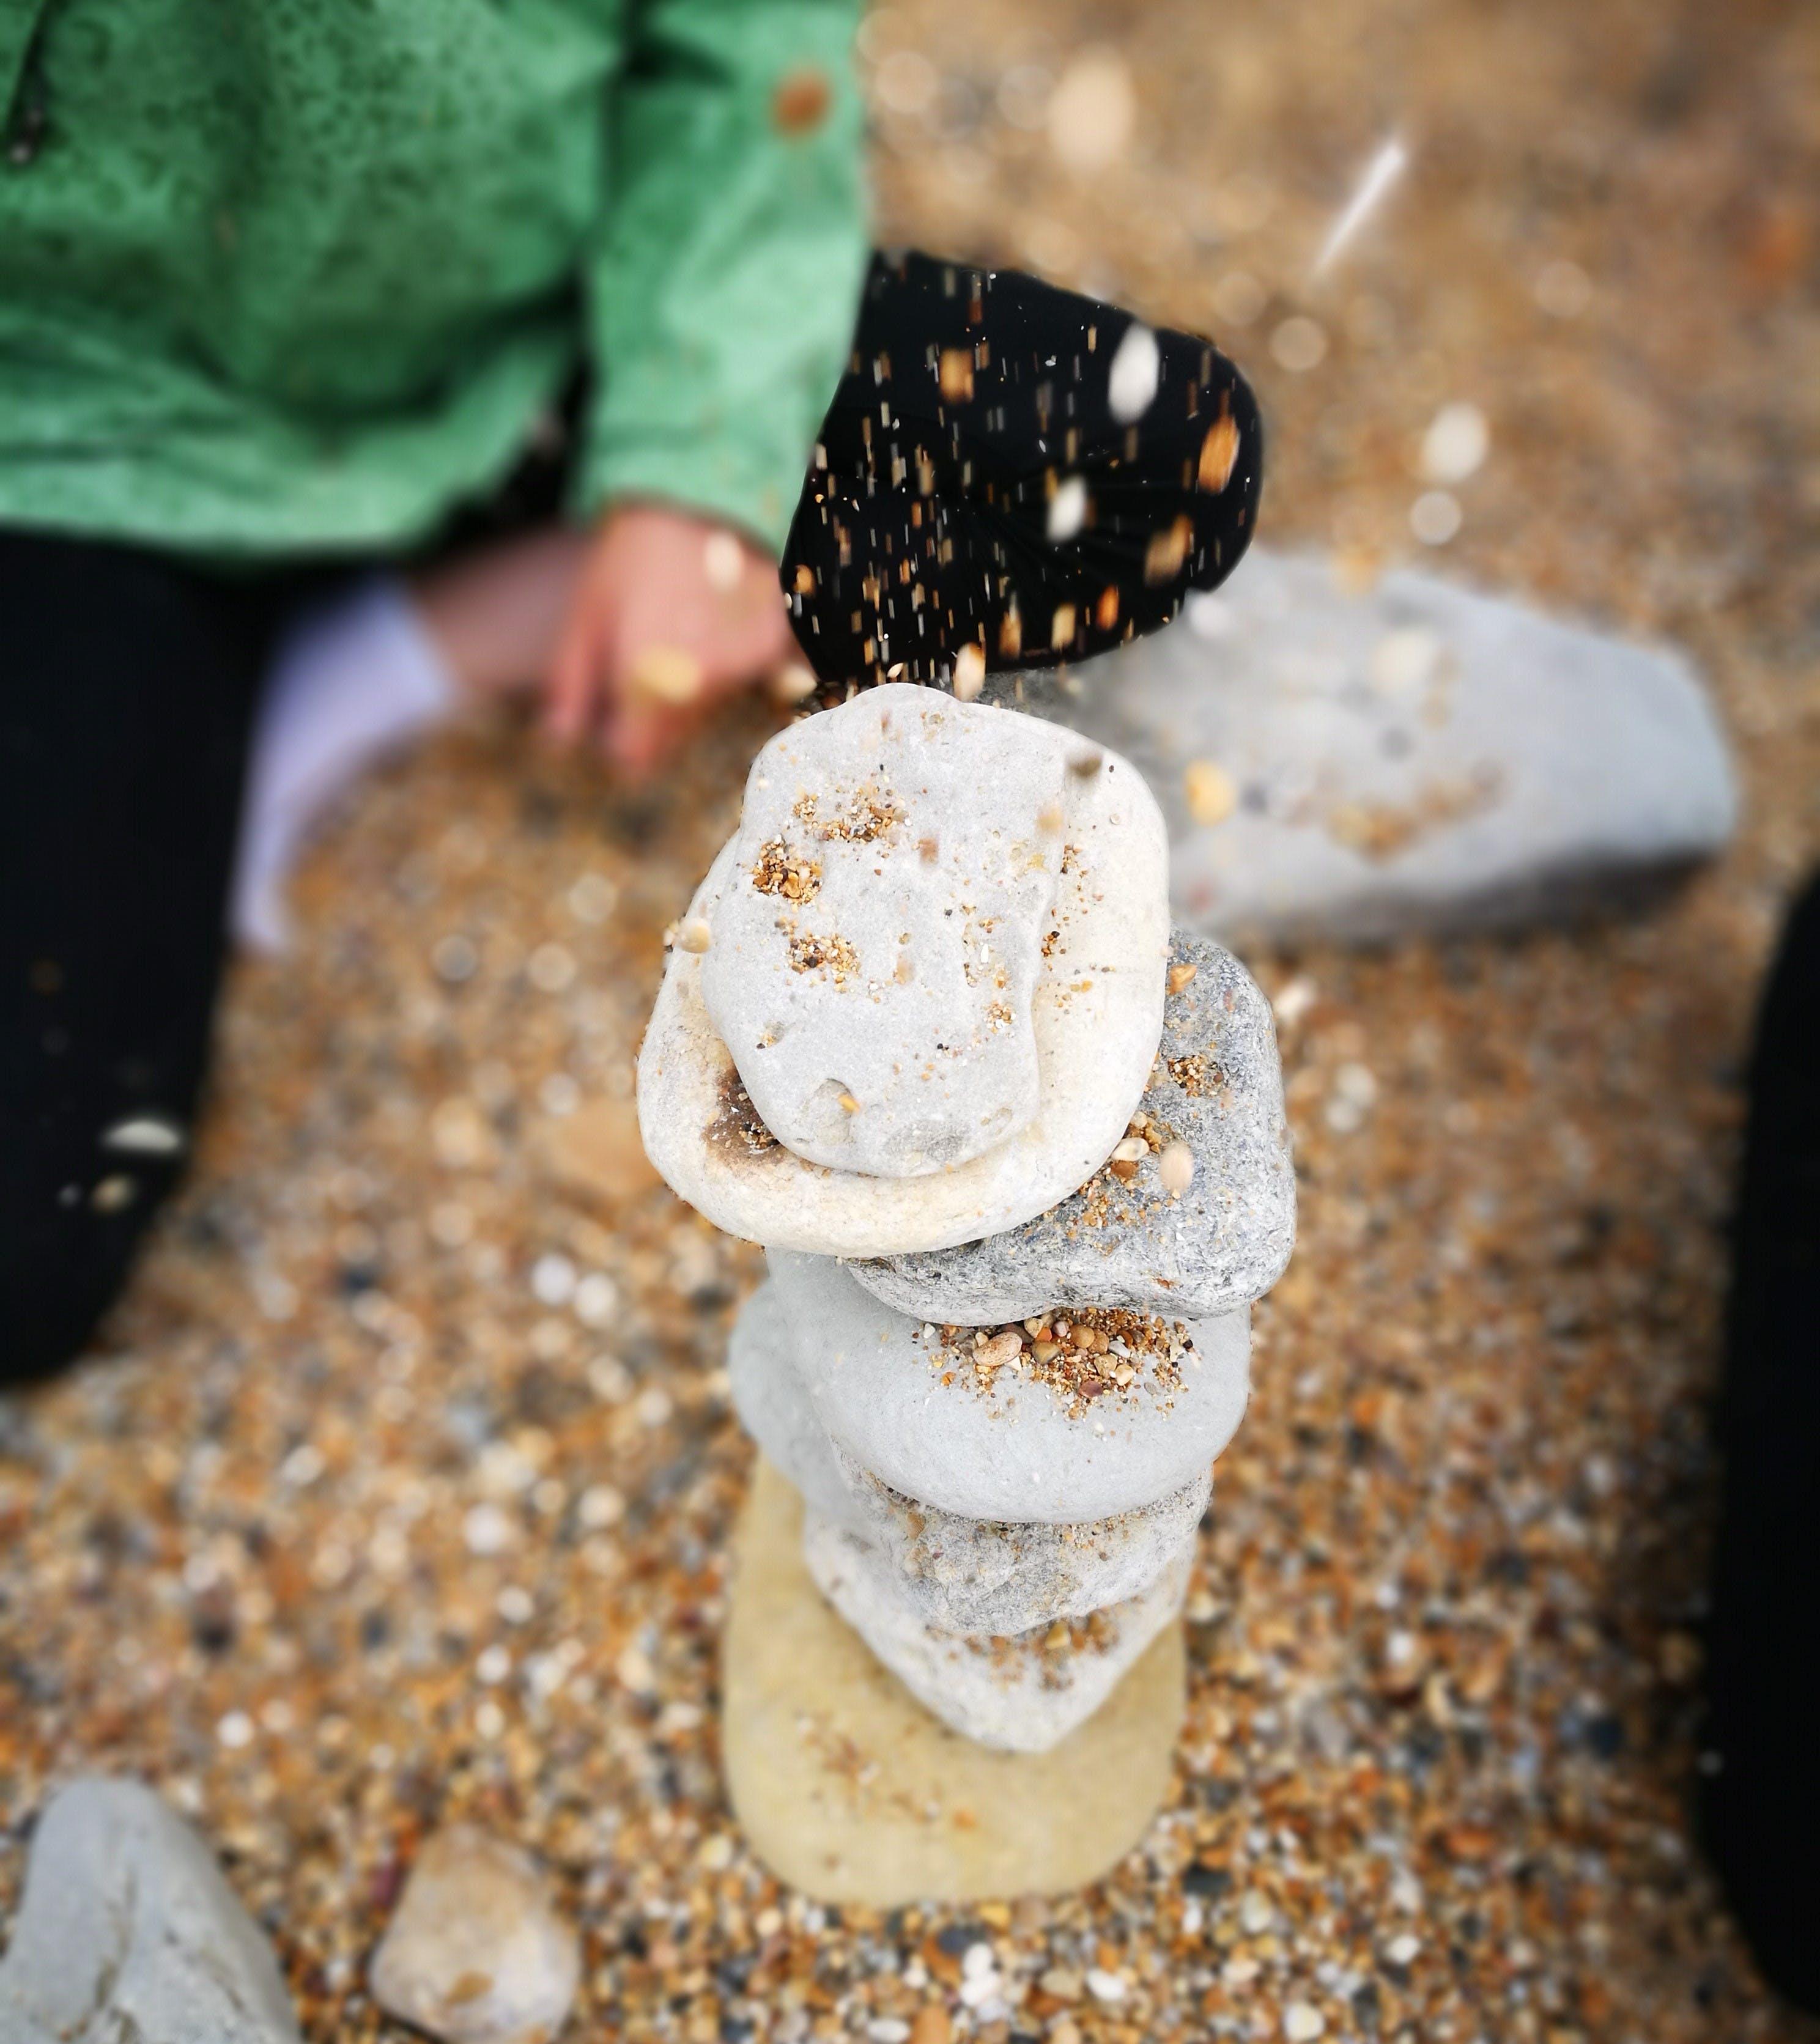 Gratis lagerfoto af småsten, sten tårn, stenstrand